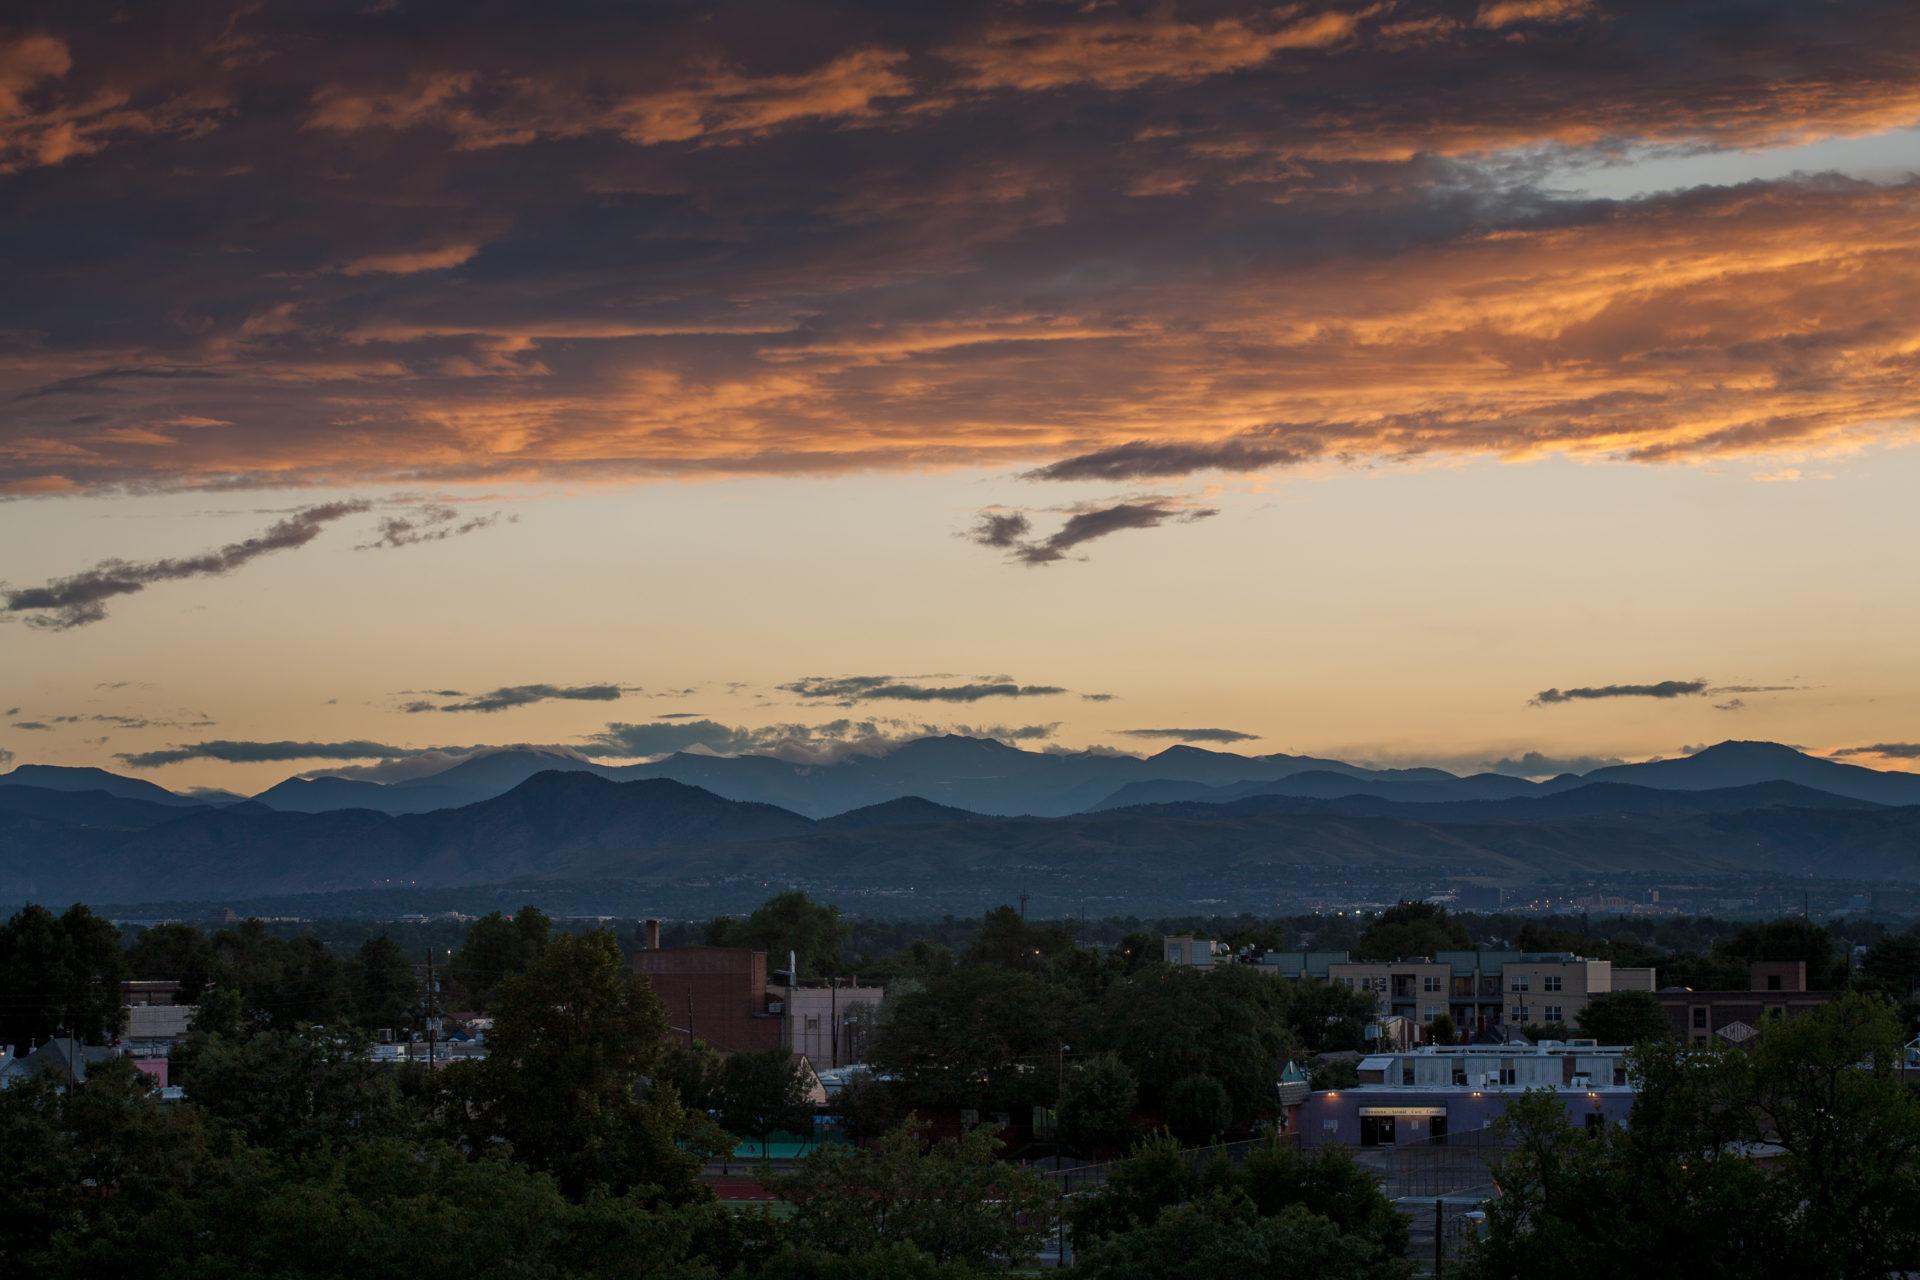 Mount Evans sunset - August 4, 2011